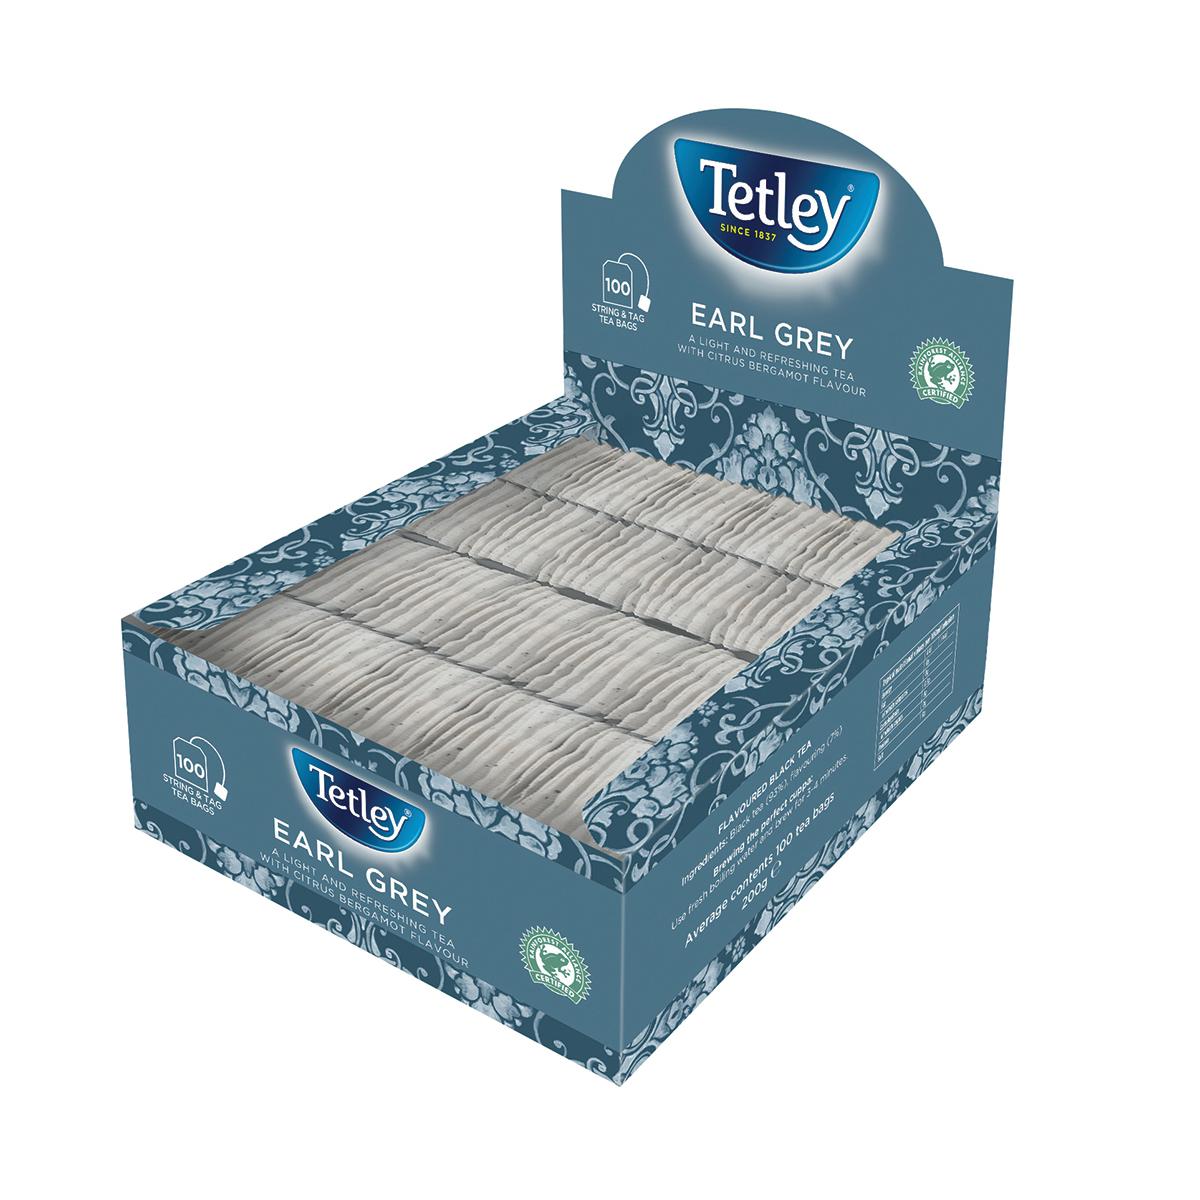 Tetley Individually Enveloped Tea Bags String and Tag Earl Grey Ref 1243Y [Boxed 100]